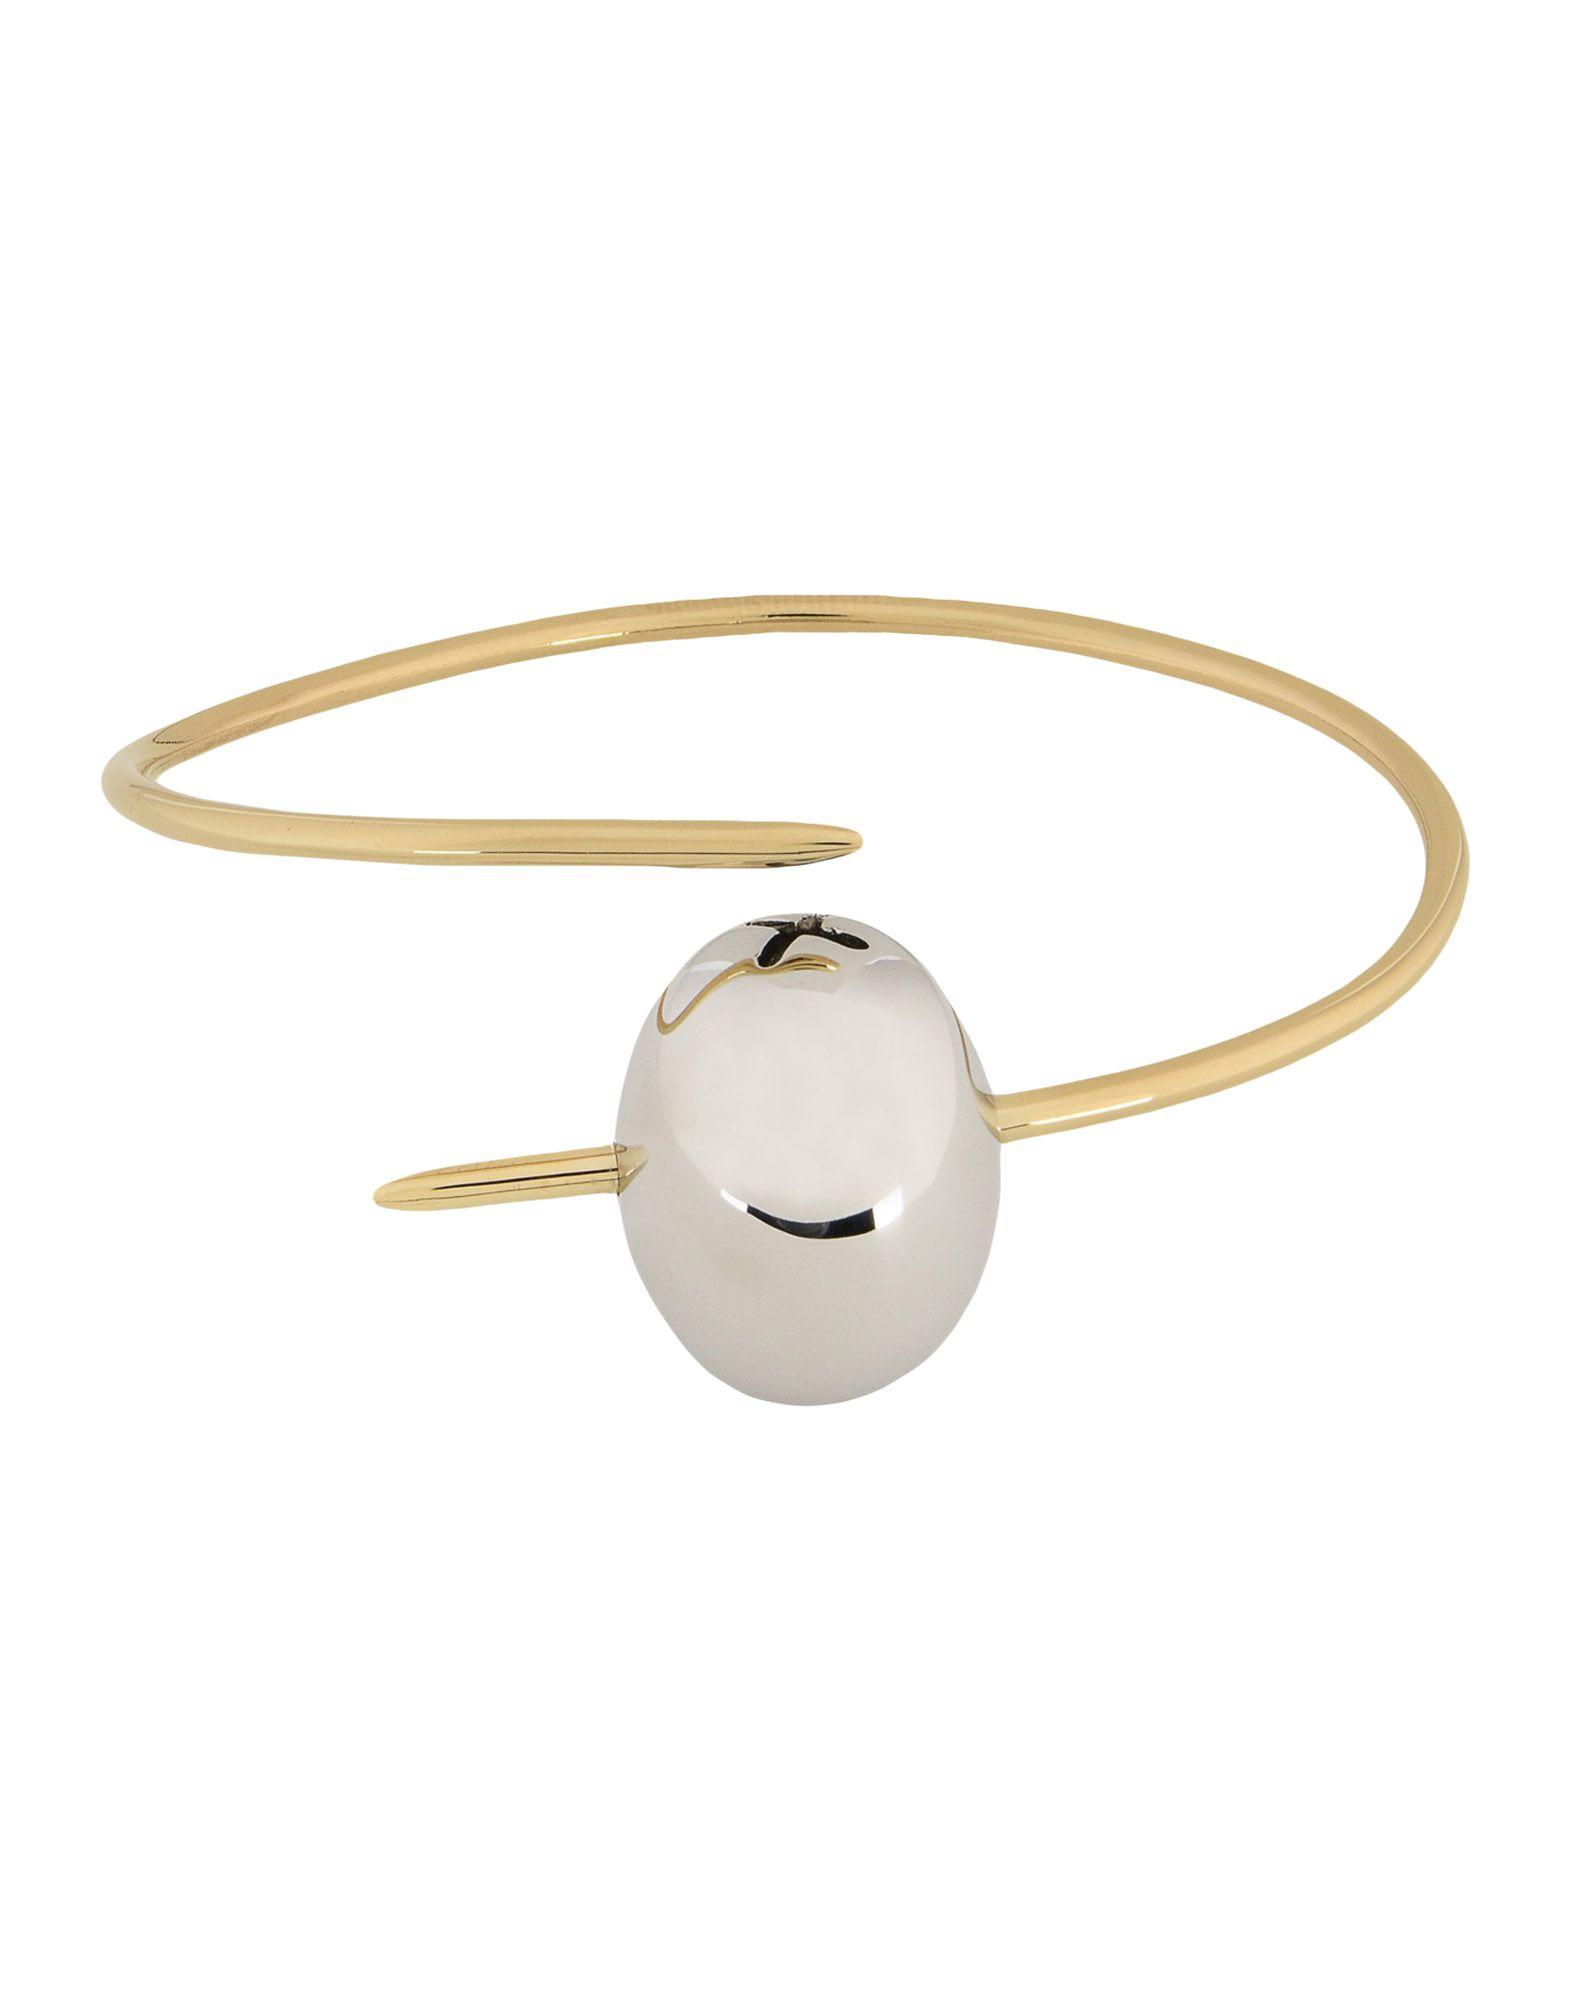 Bracciale Schield Olive Bracelet - Donna - Acquista online su